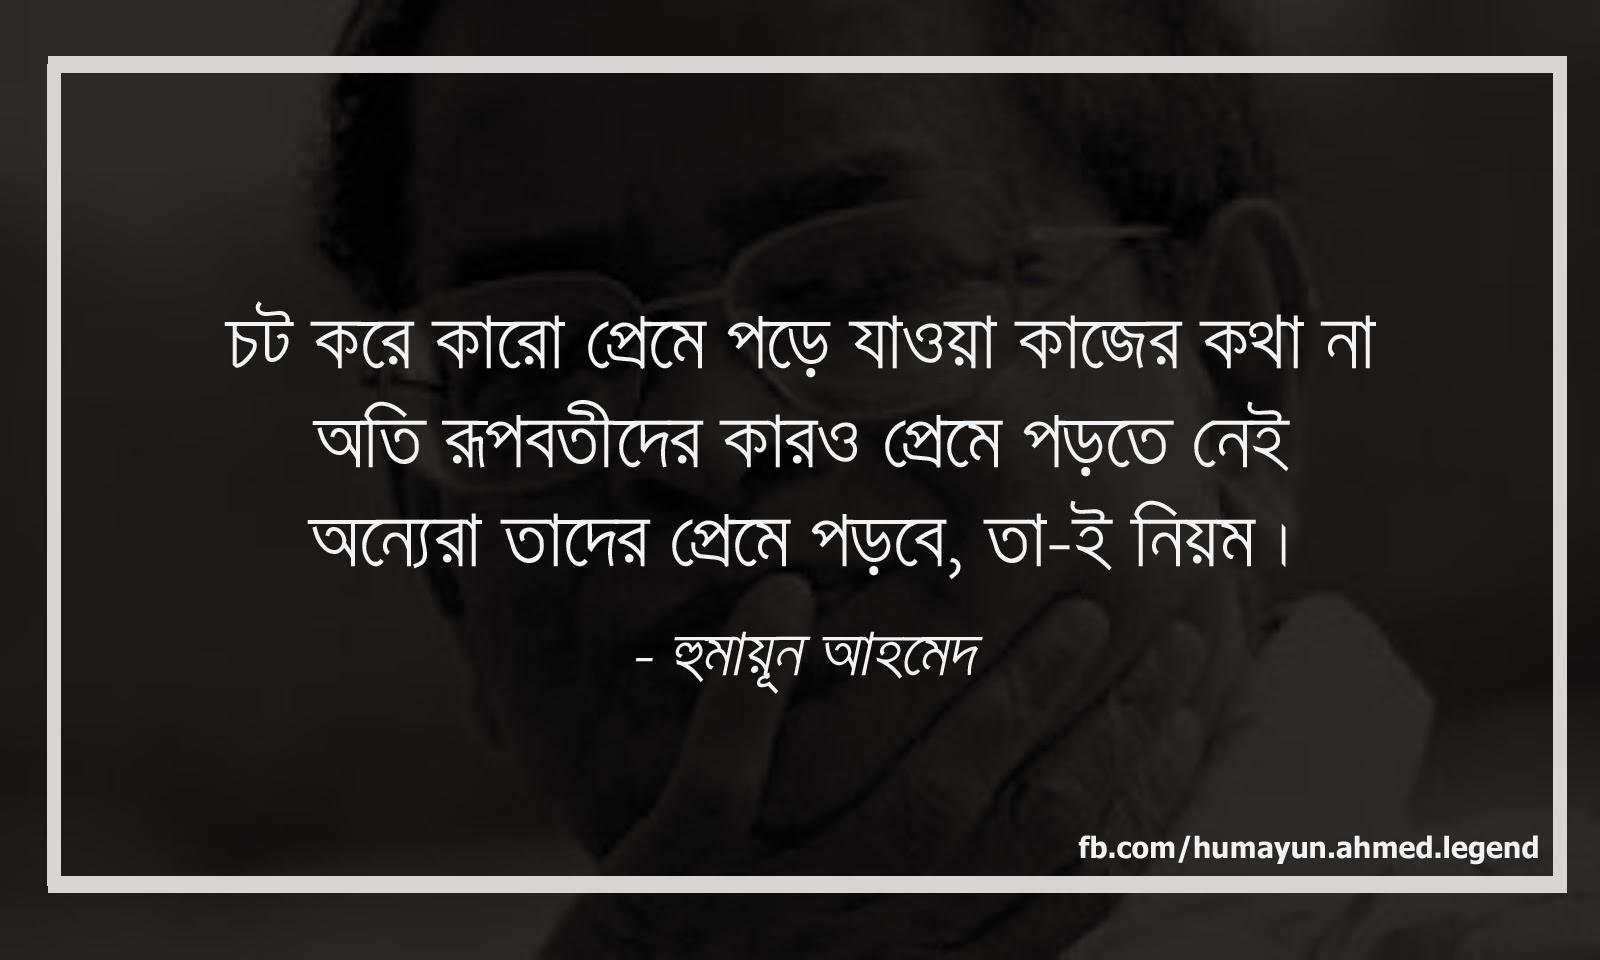 Real life quotes of humayun ahmed